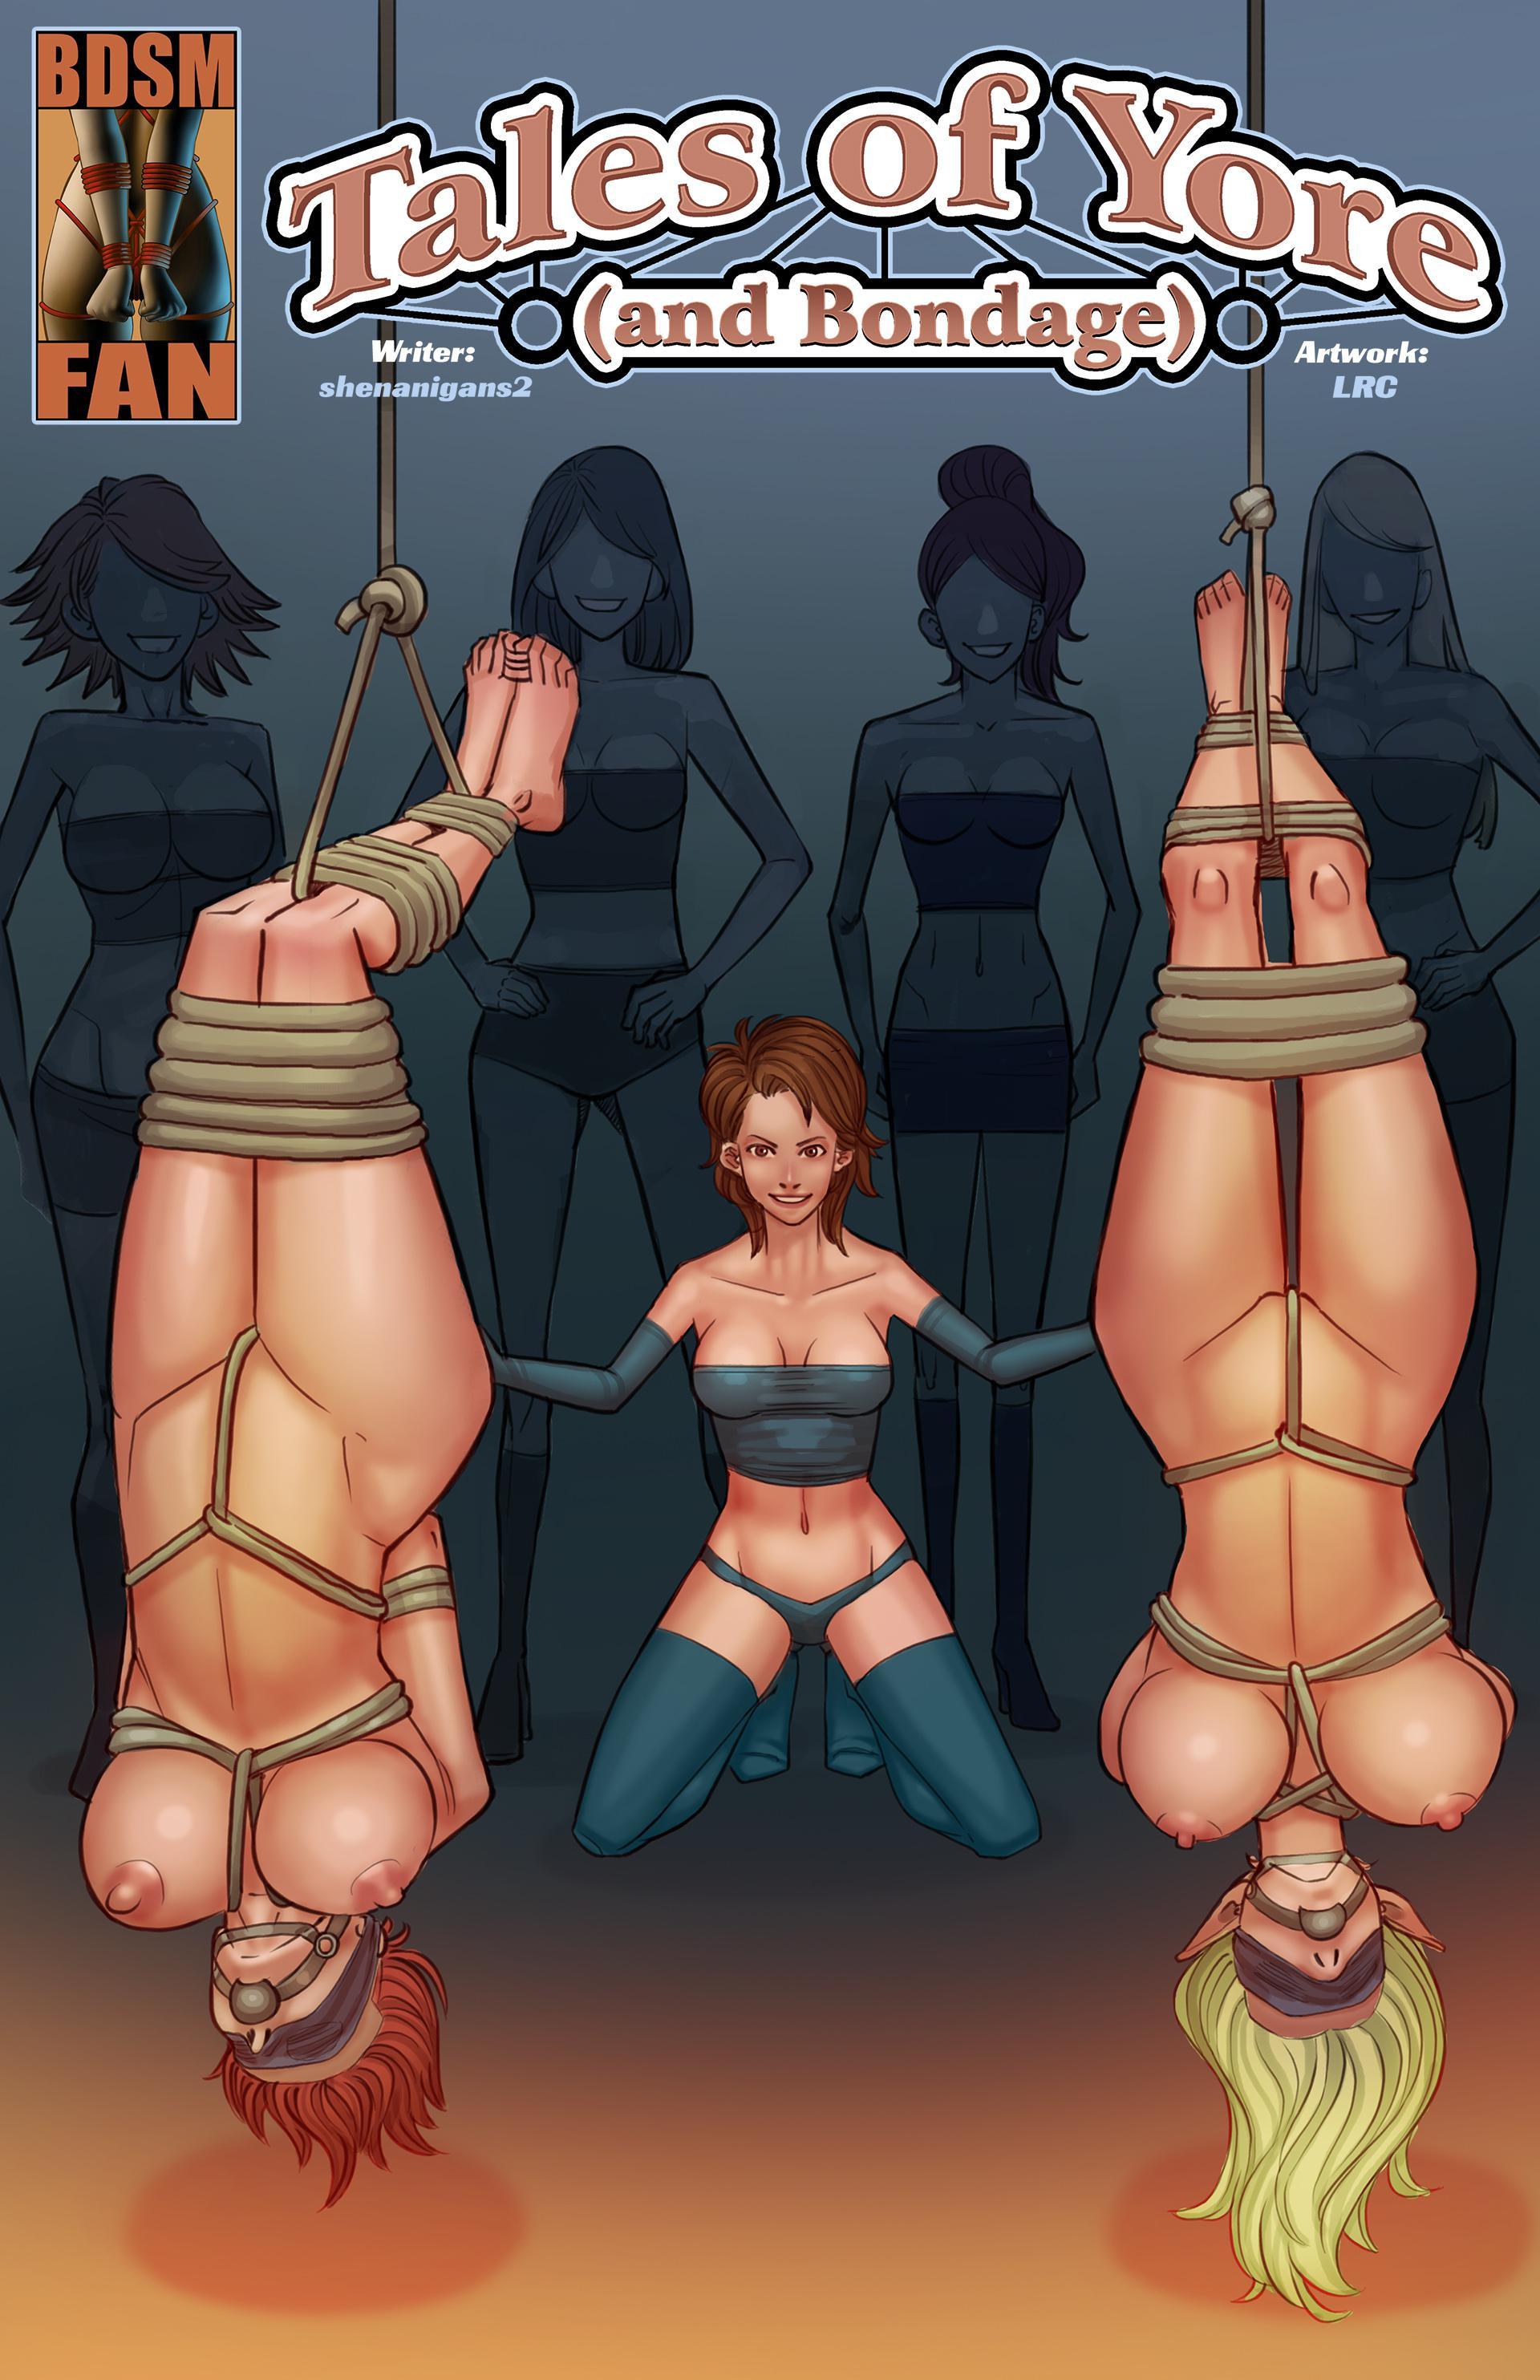 Adult Porn Bdsm bdsm fan- tales of yore and bondage free porn comic - hd